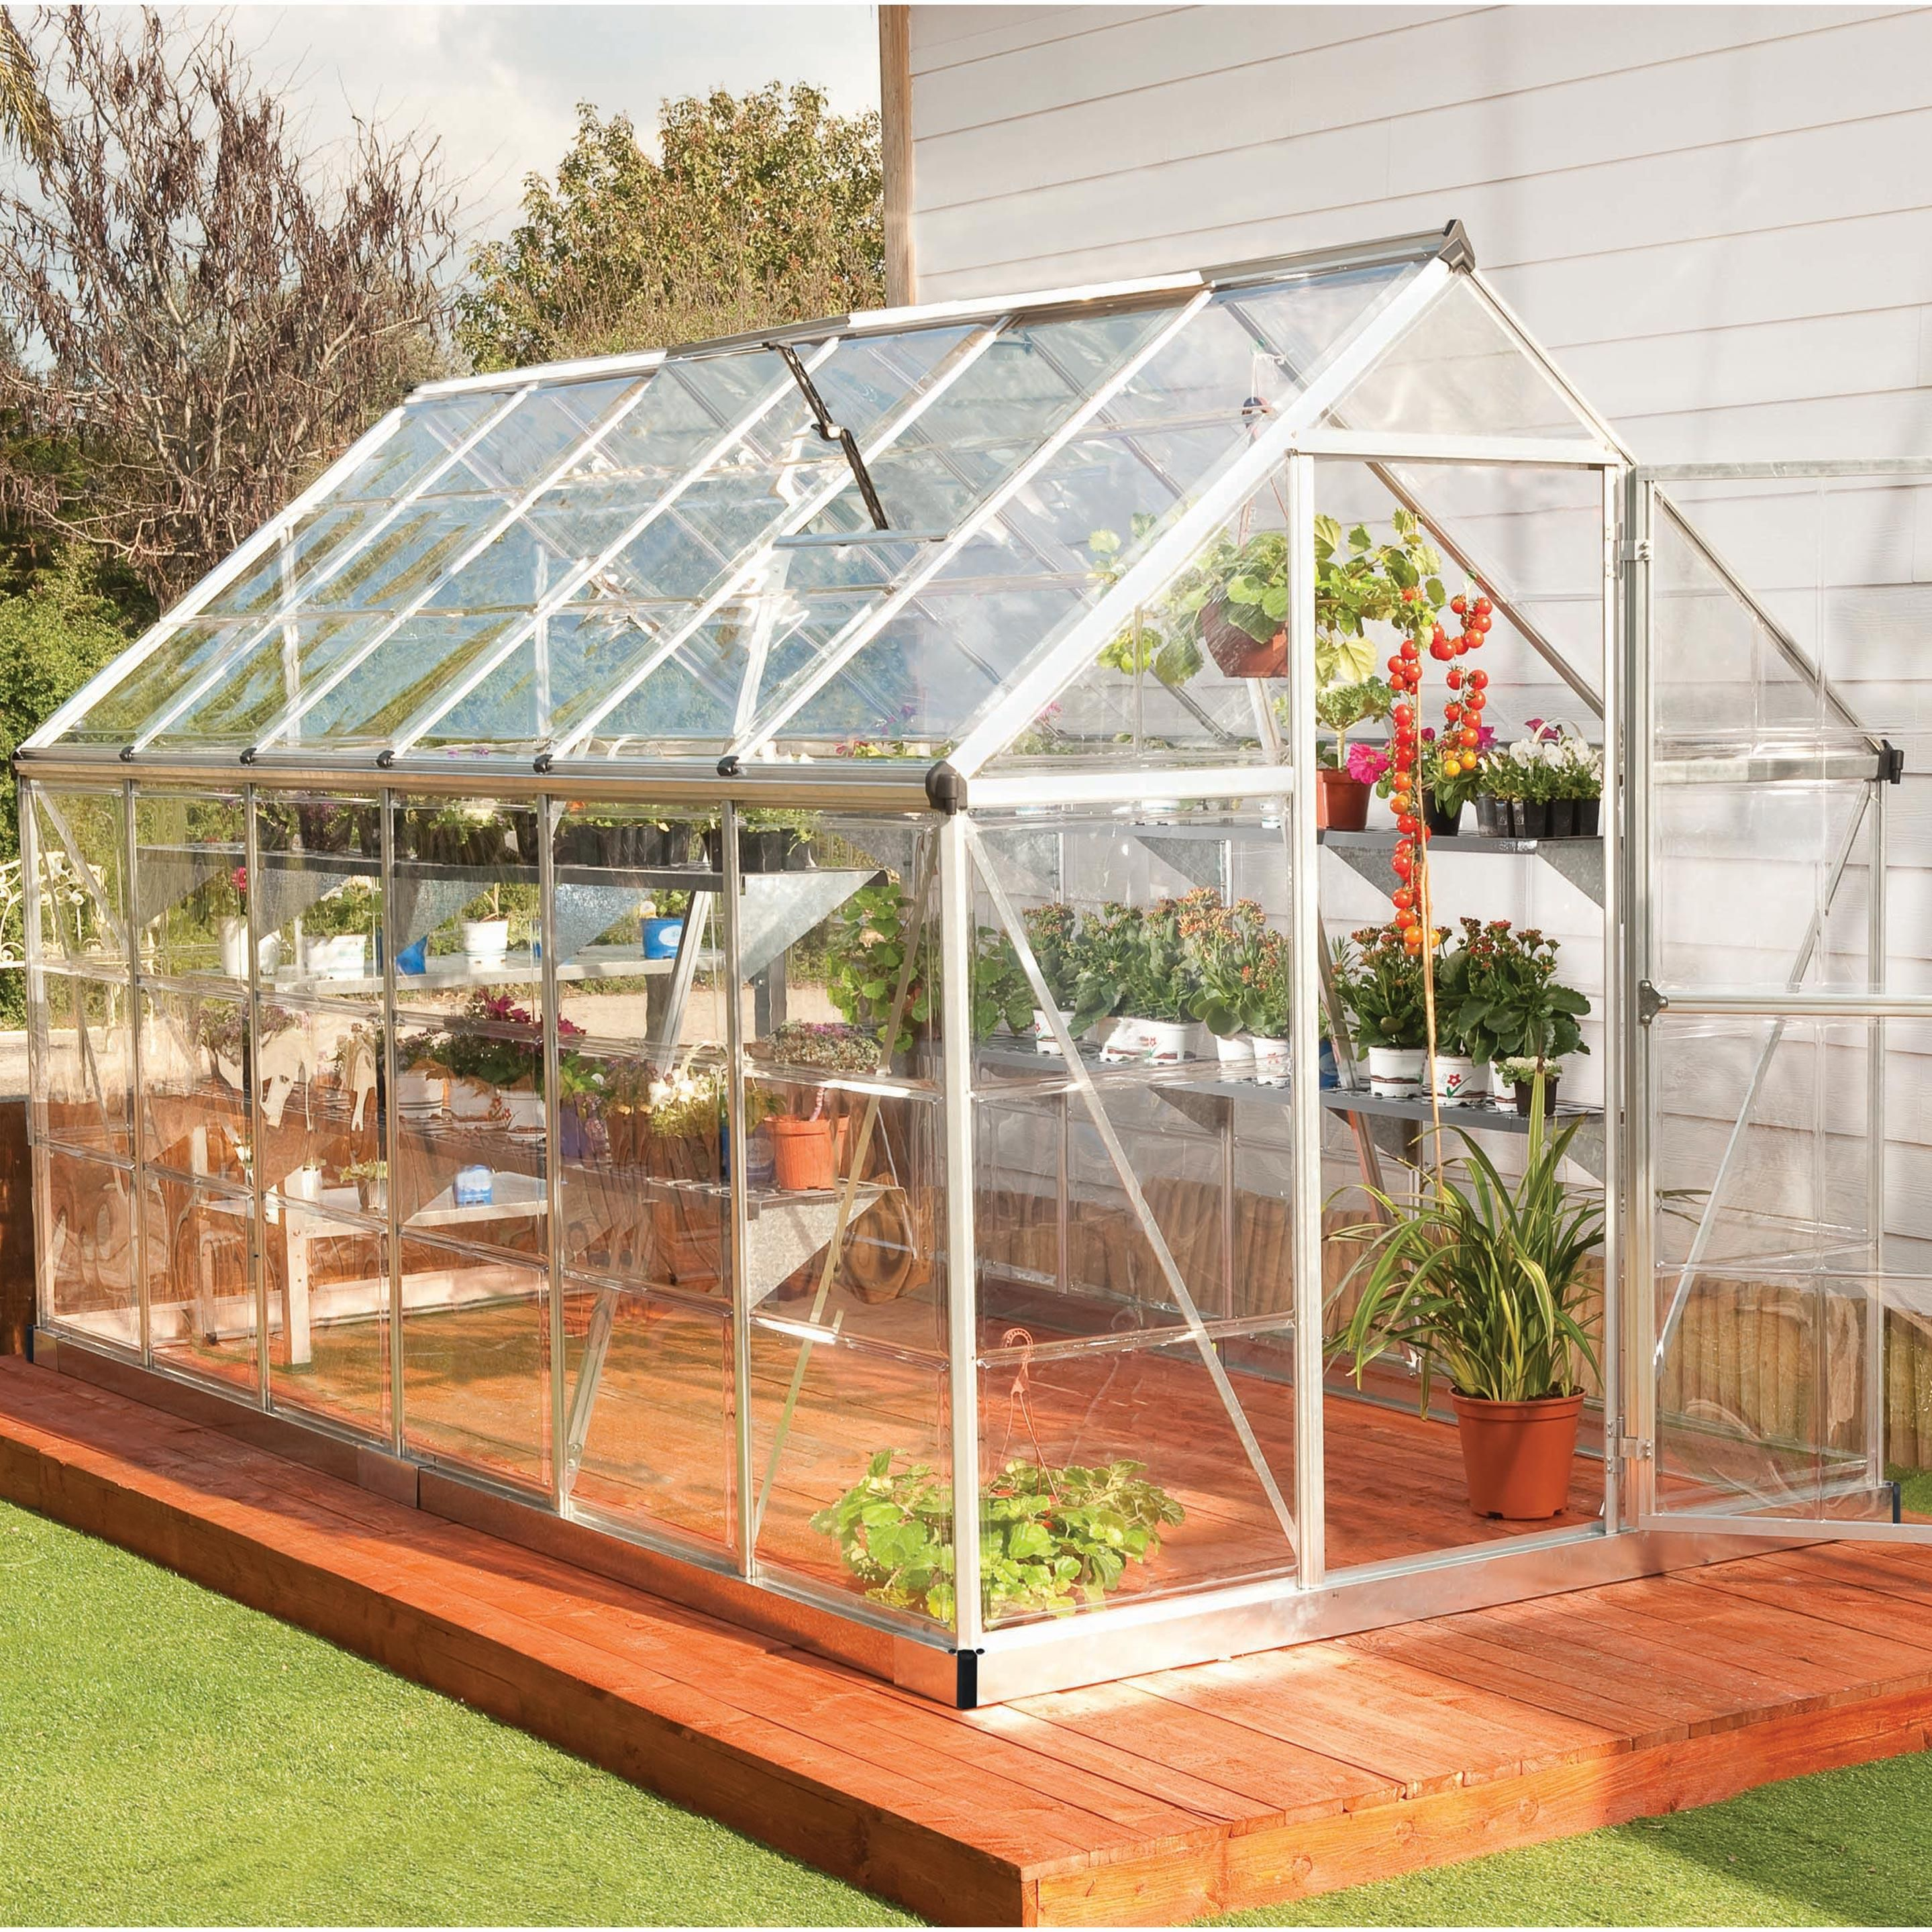 Serre De Jardin Argent Harmony 6 8 M Aluminium Et Polycarbonate Palram En 2020 Serre Jardin Petite Serre Et Maison Verte